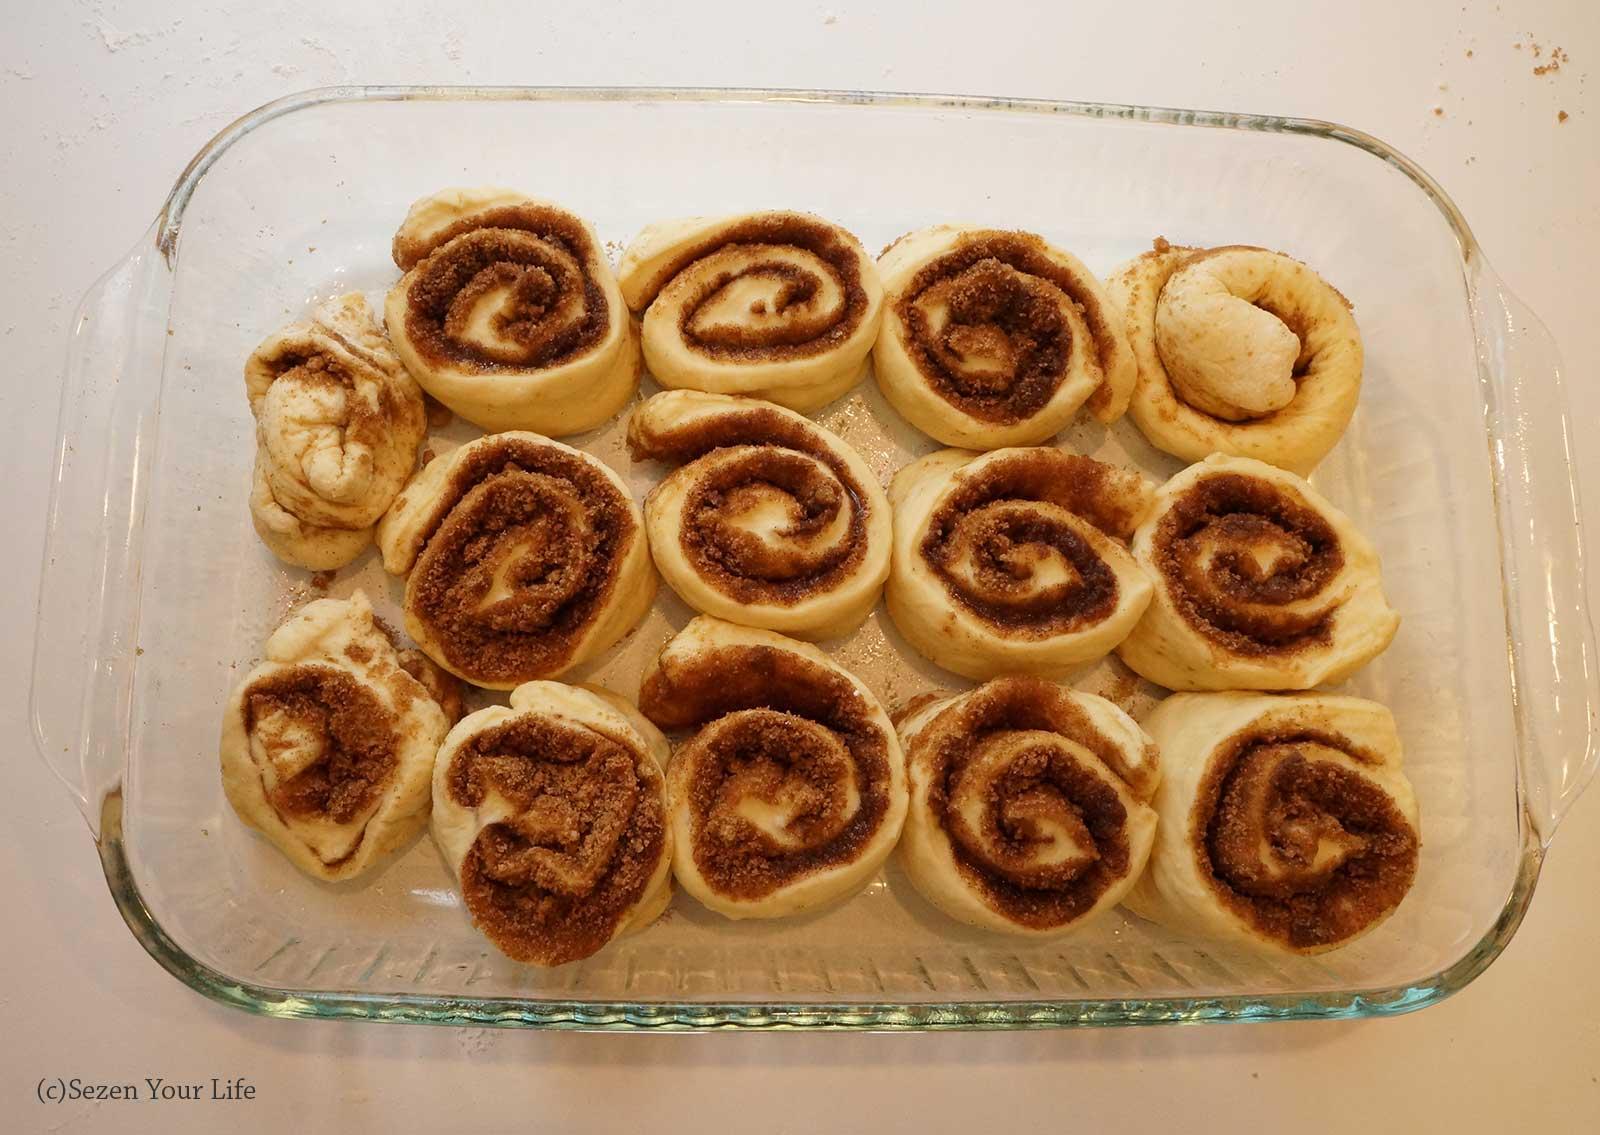 Cinnamon Rolls Ready for Baking by Sarah Franzen